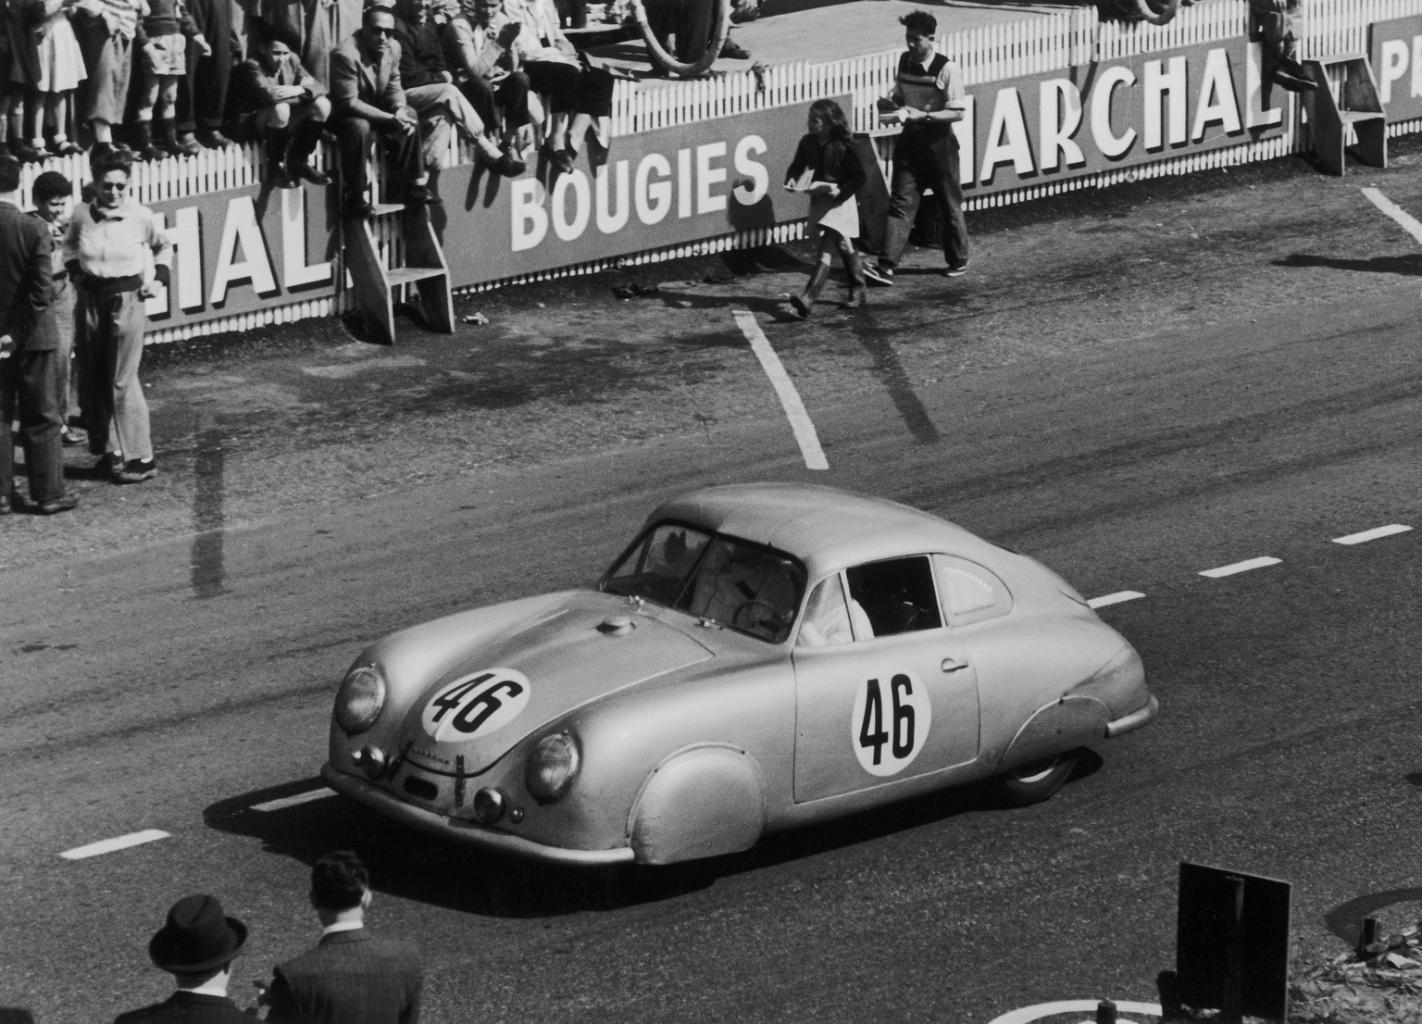 1951_Porsche_356SLGmndCoup-0-1536